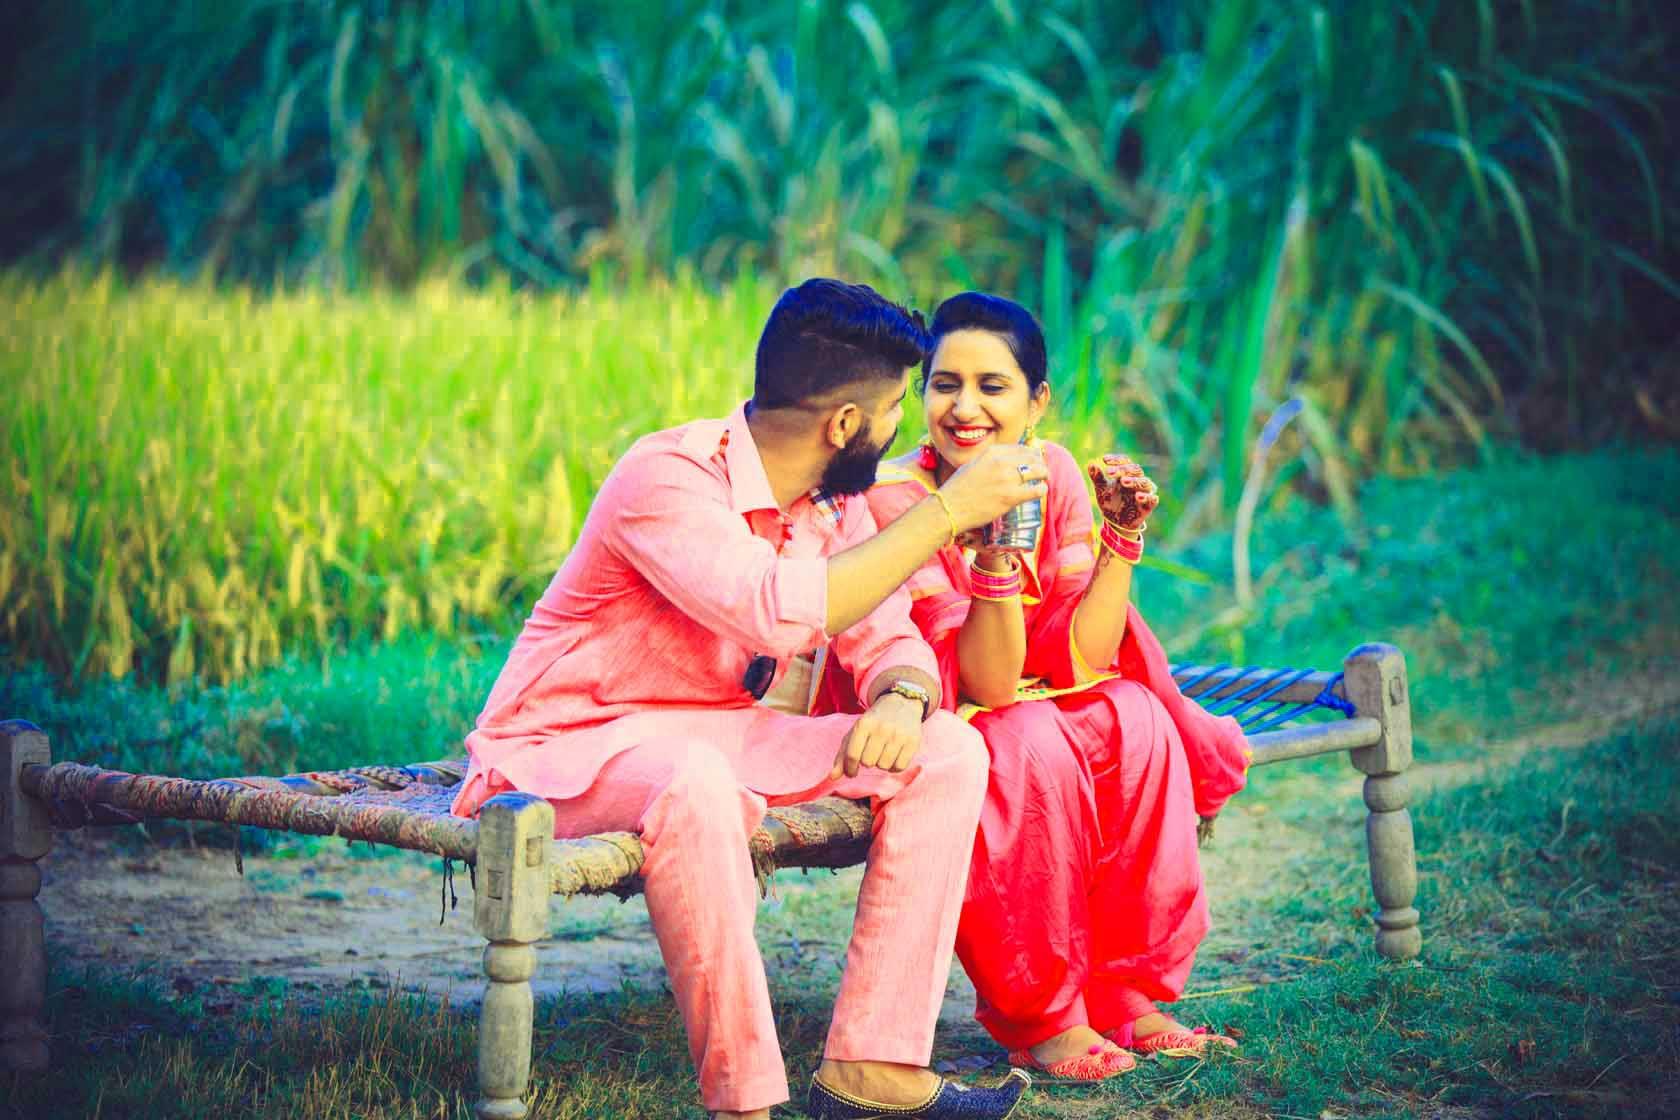 112 Punjabi Couple Wedding Images Wallpaper Photo Free Punjabi Couple 189534 Hd Wallpaper Backgrounds Download